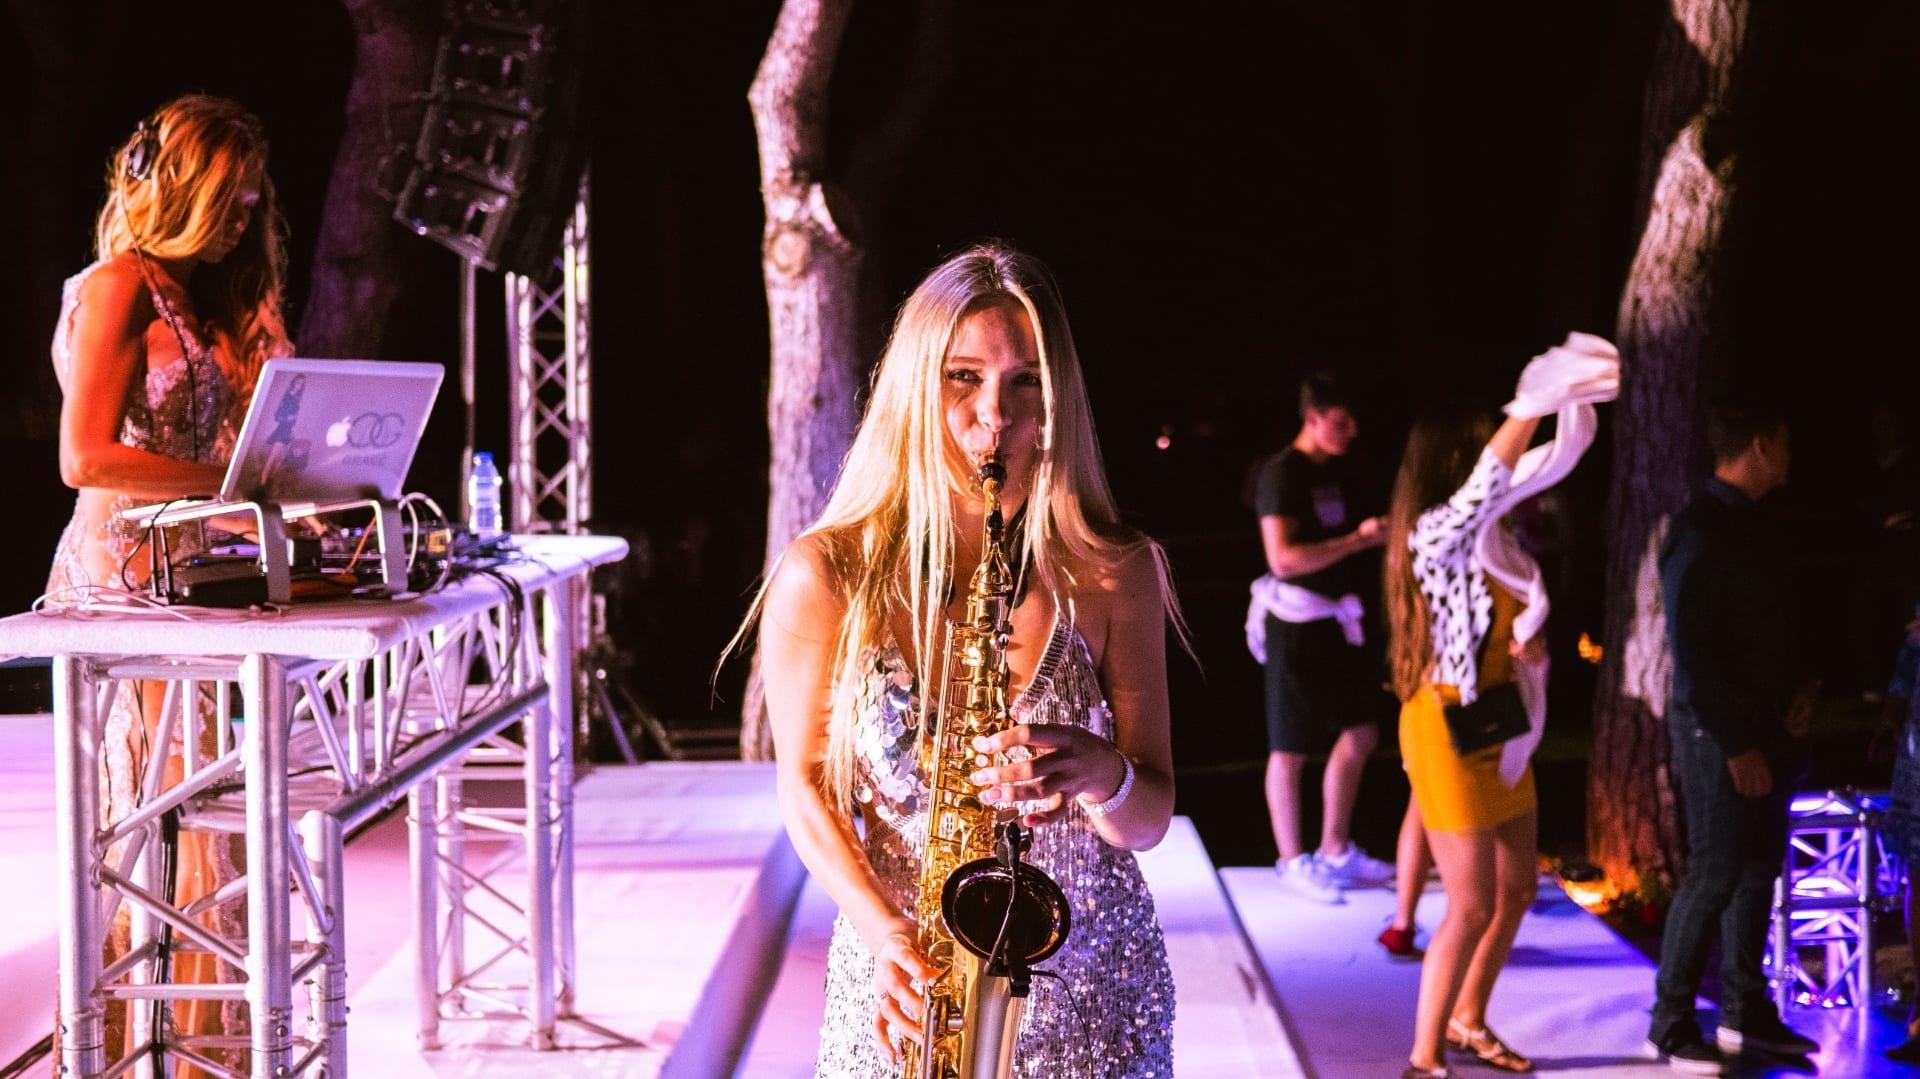 DJ Plus Saxophon: Sophia spielt live